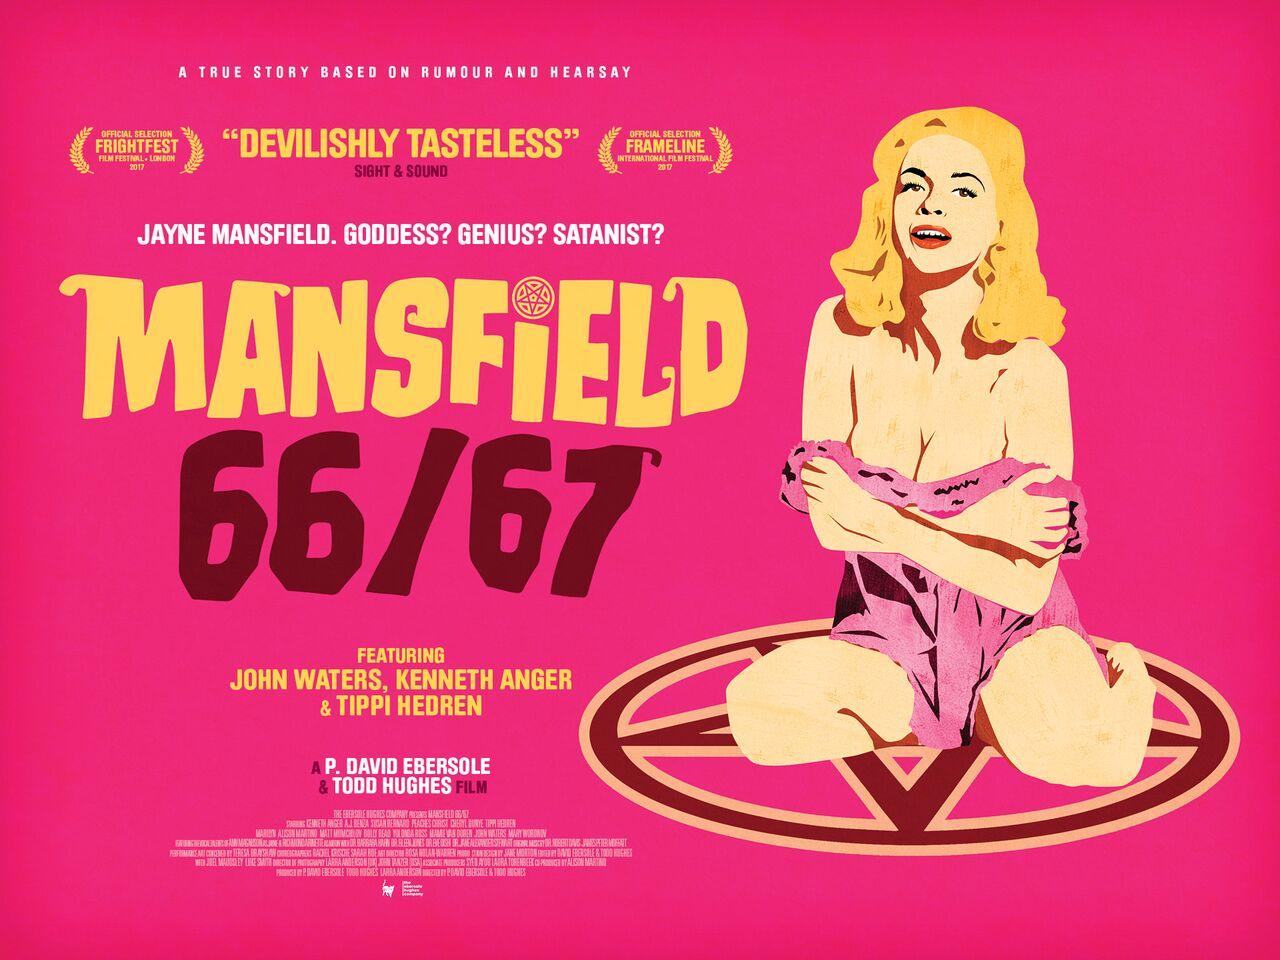 Mansfield 66/67, the Jayne Mansfield story